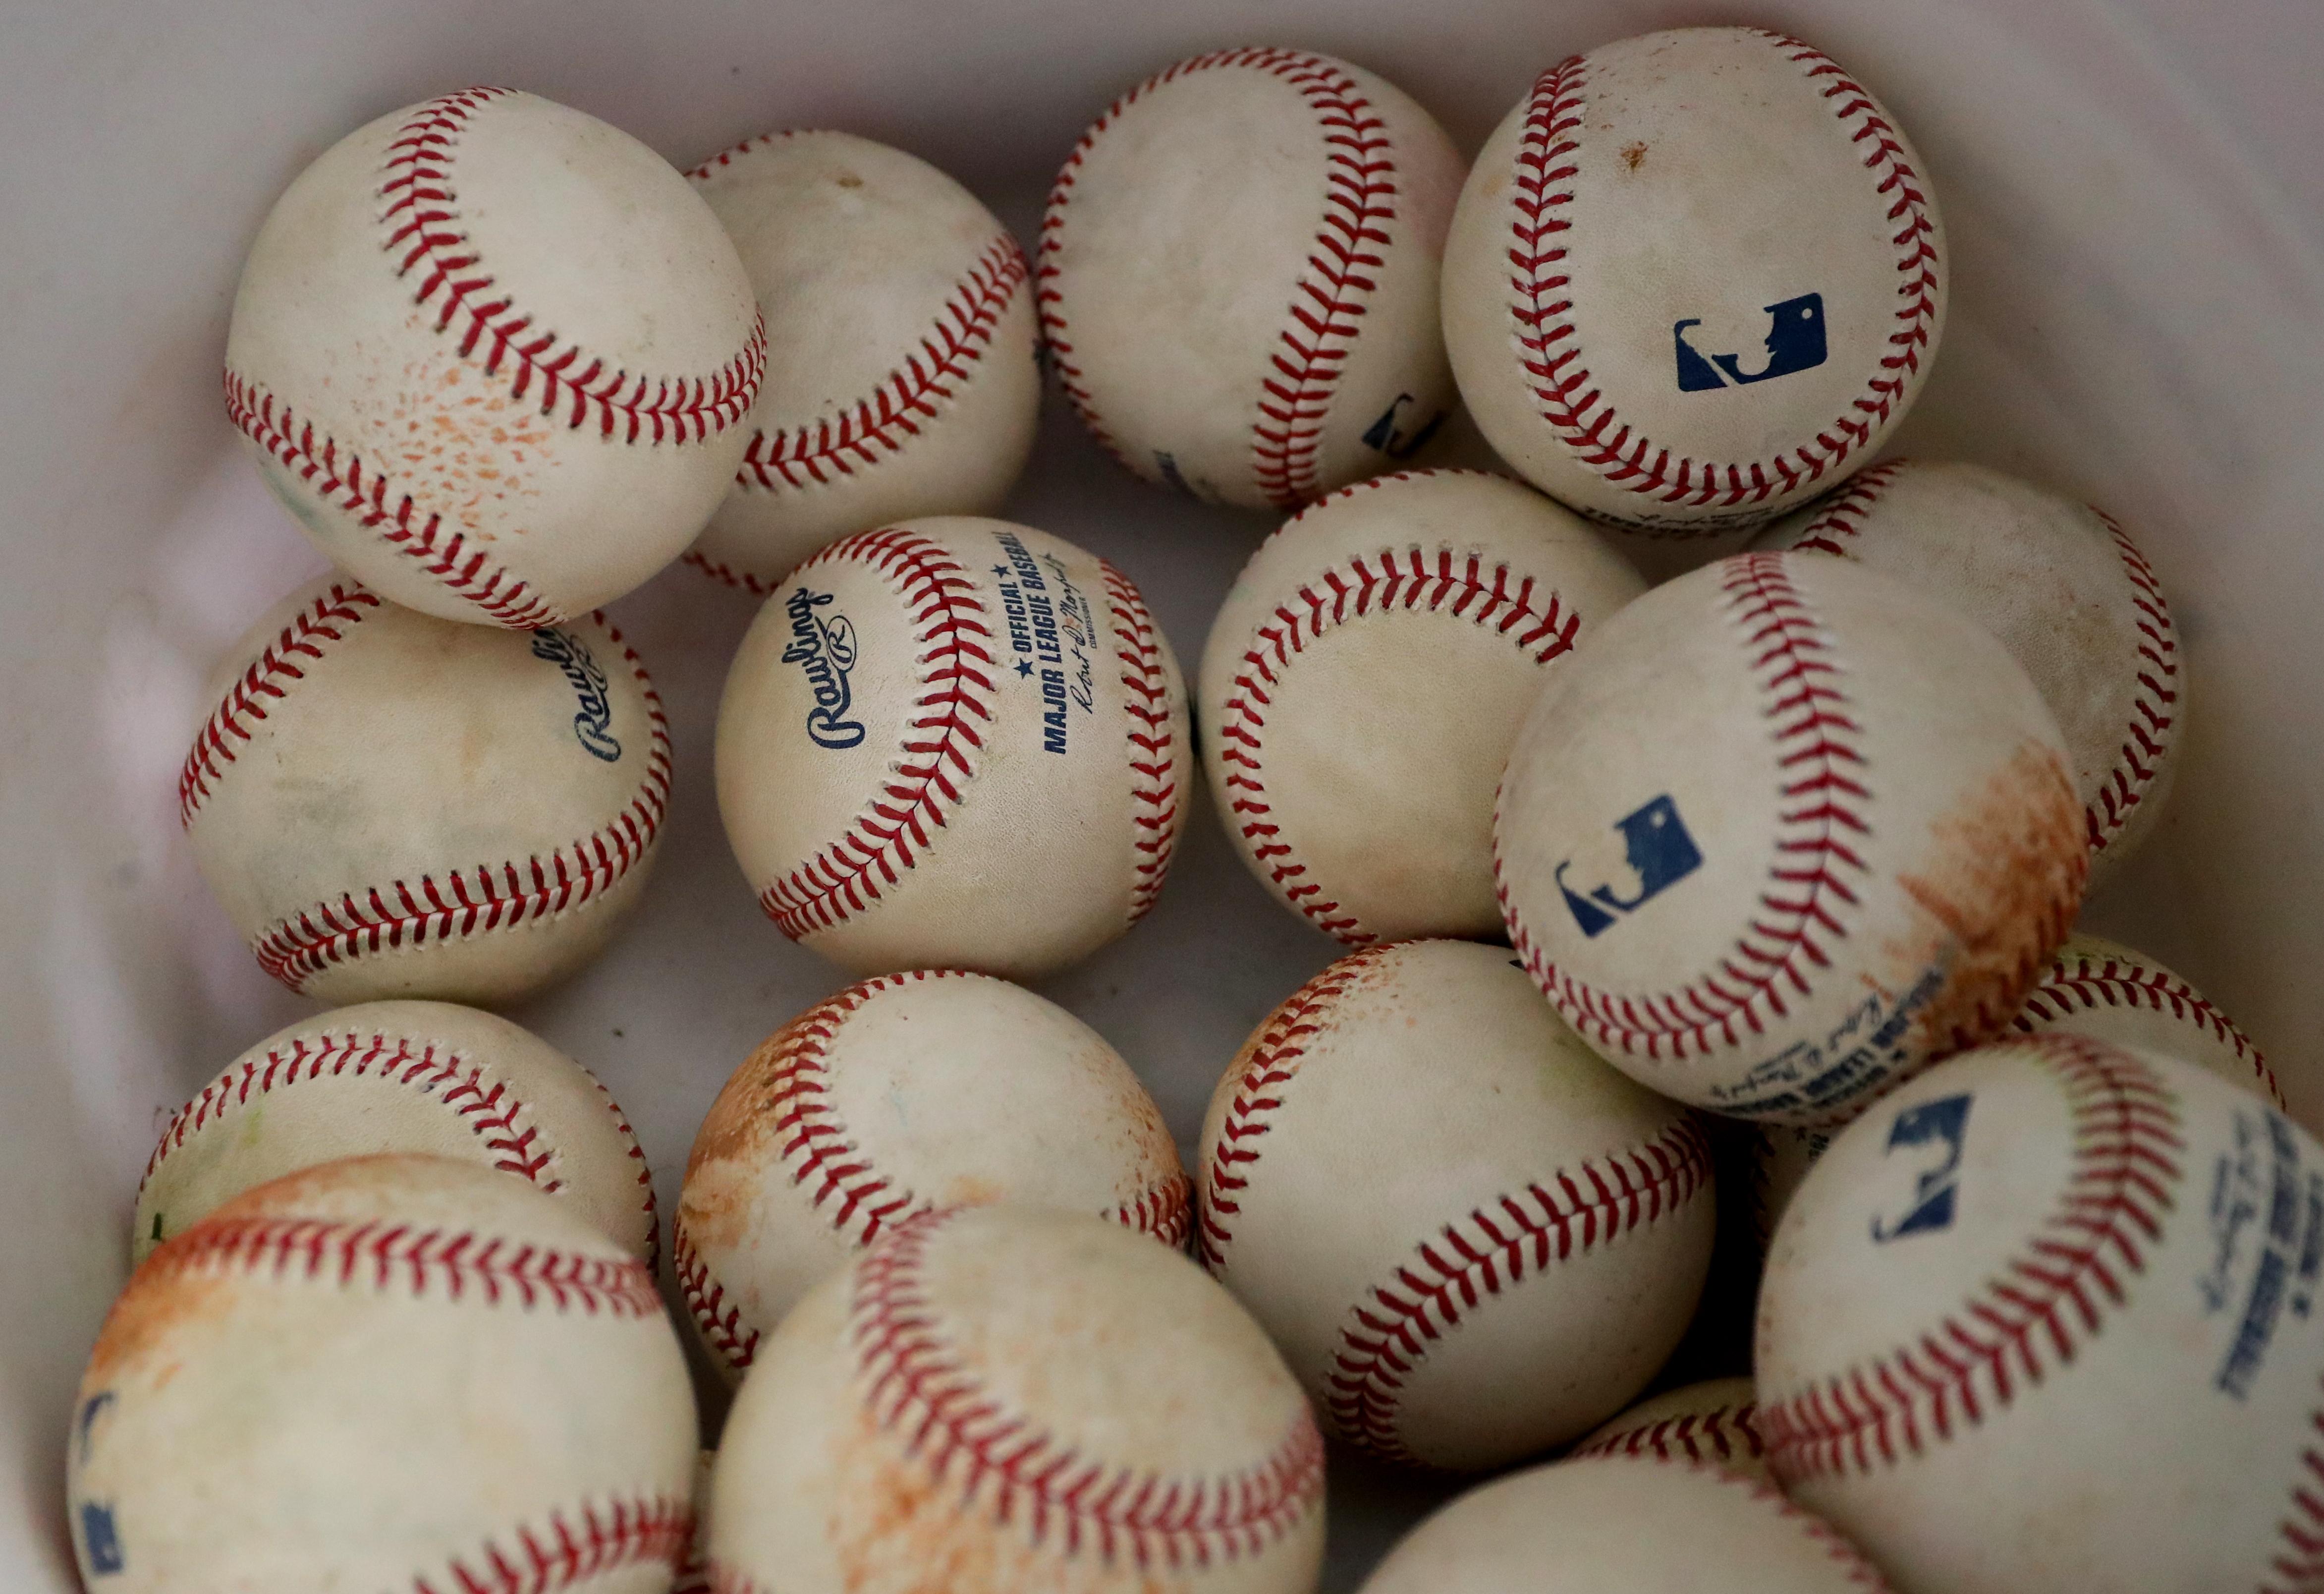 Baltimore Orioles v Toronto Blue Jays